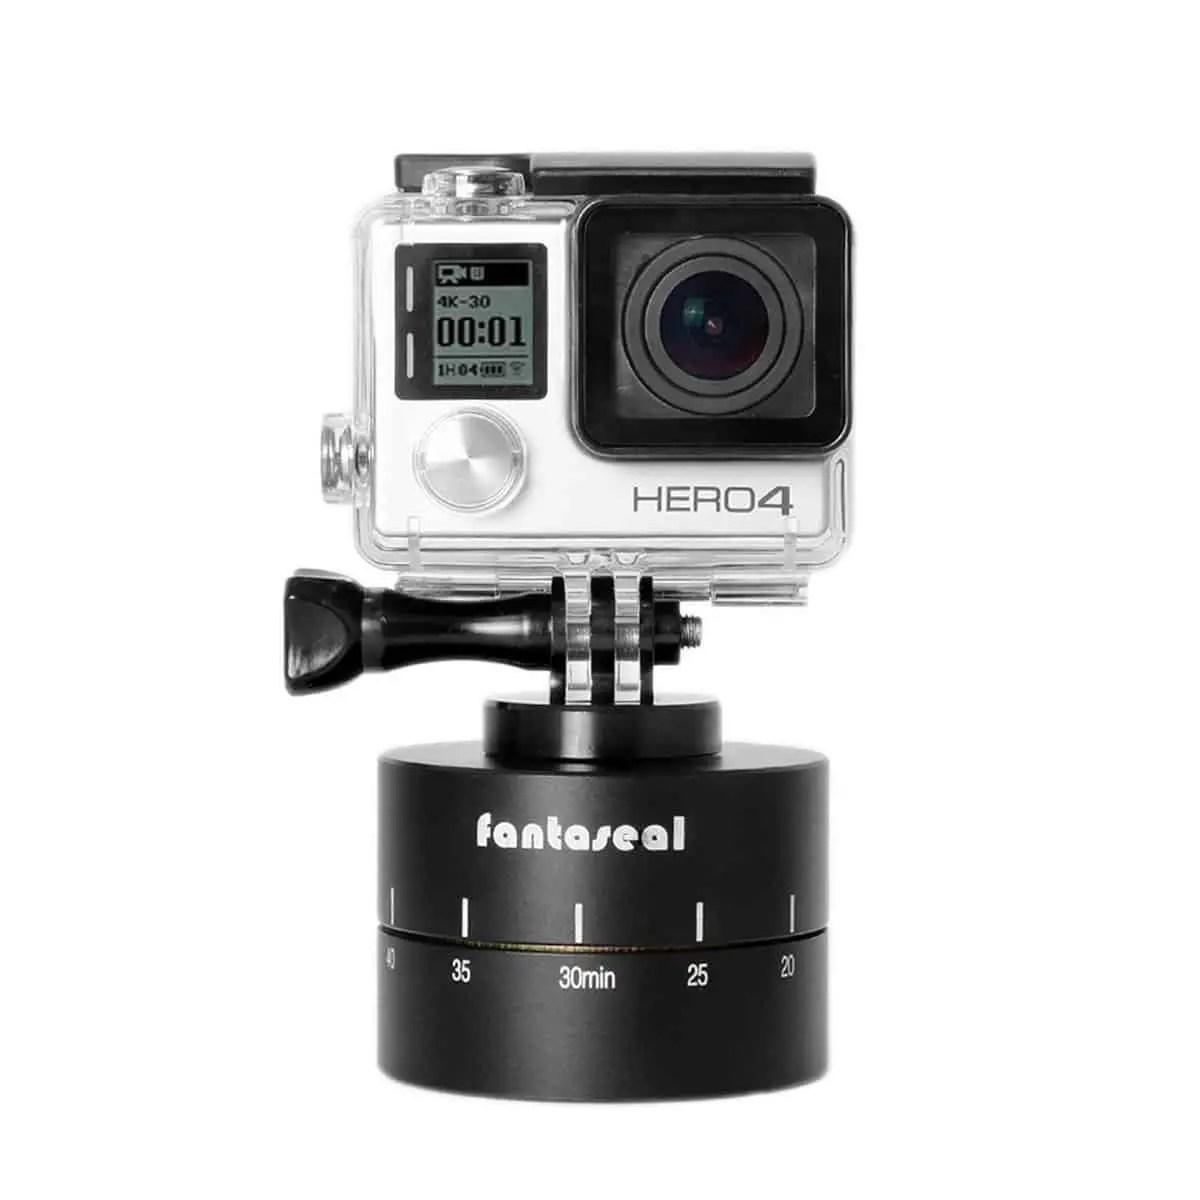 Fantaseal Time Lapse Camera Mount Review